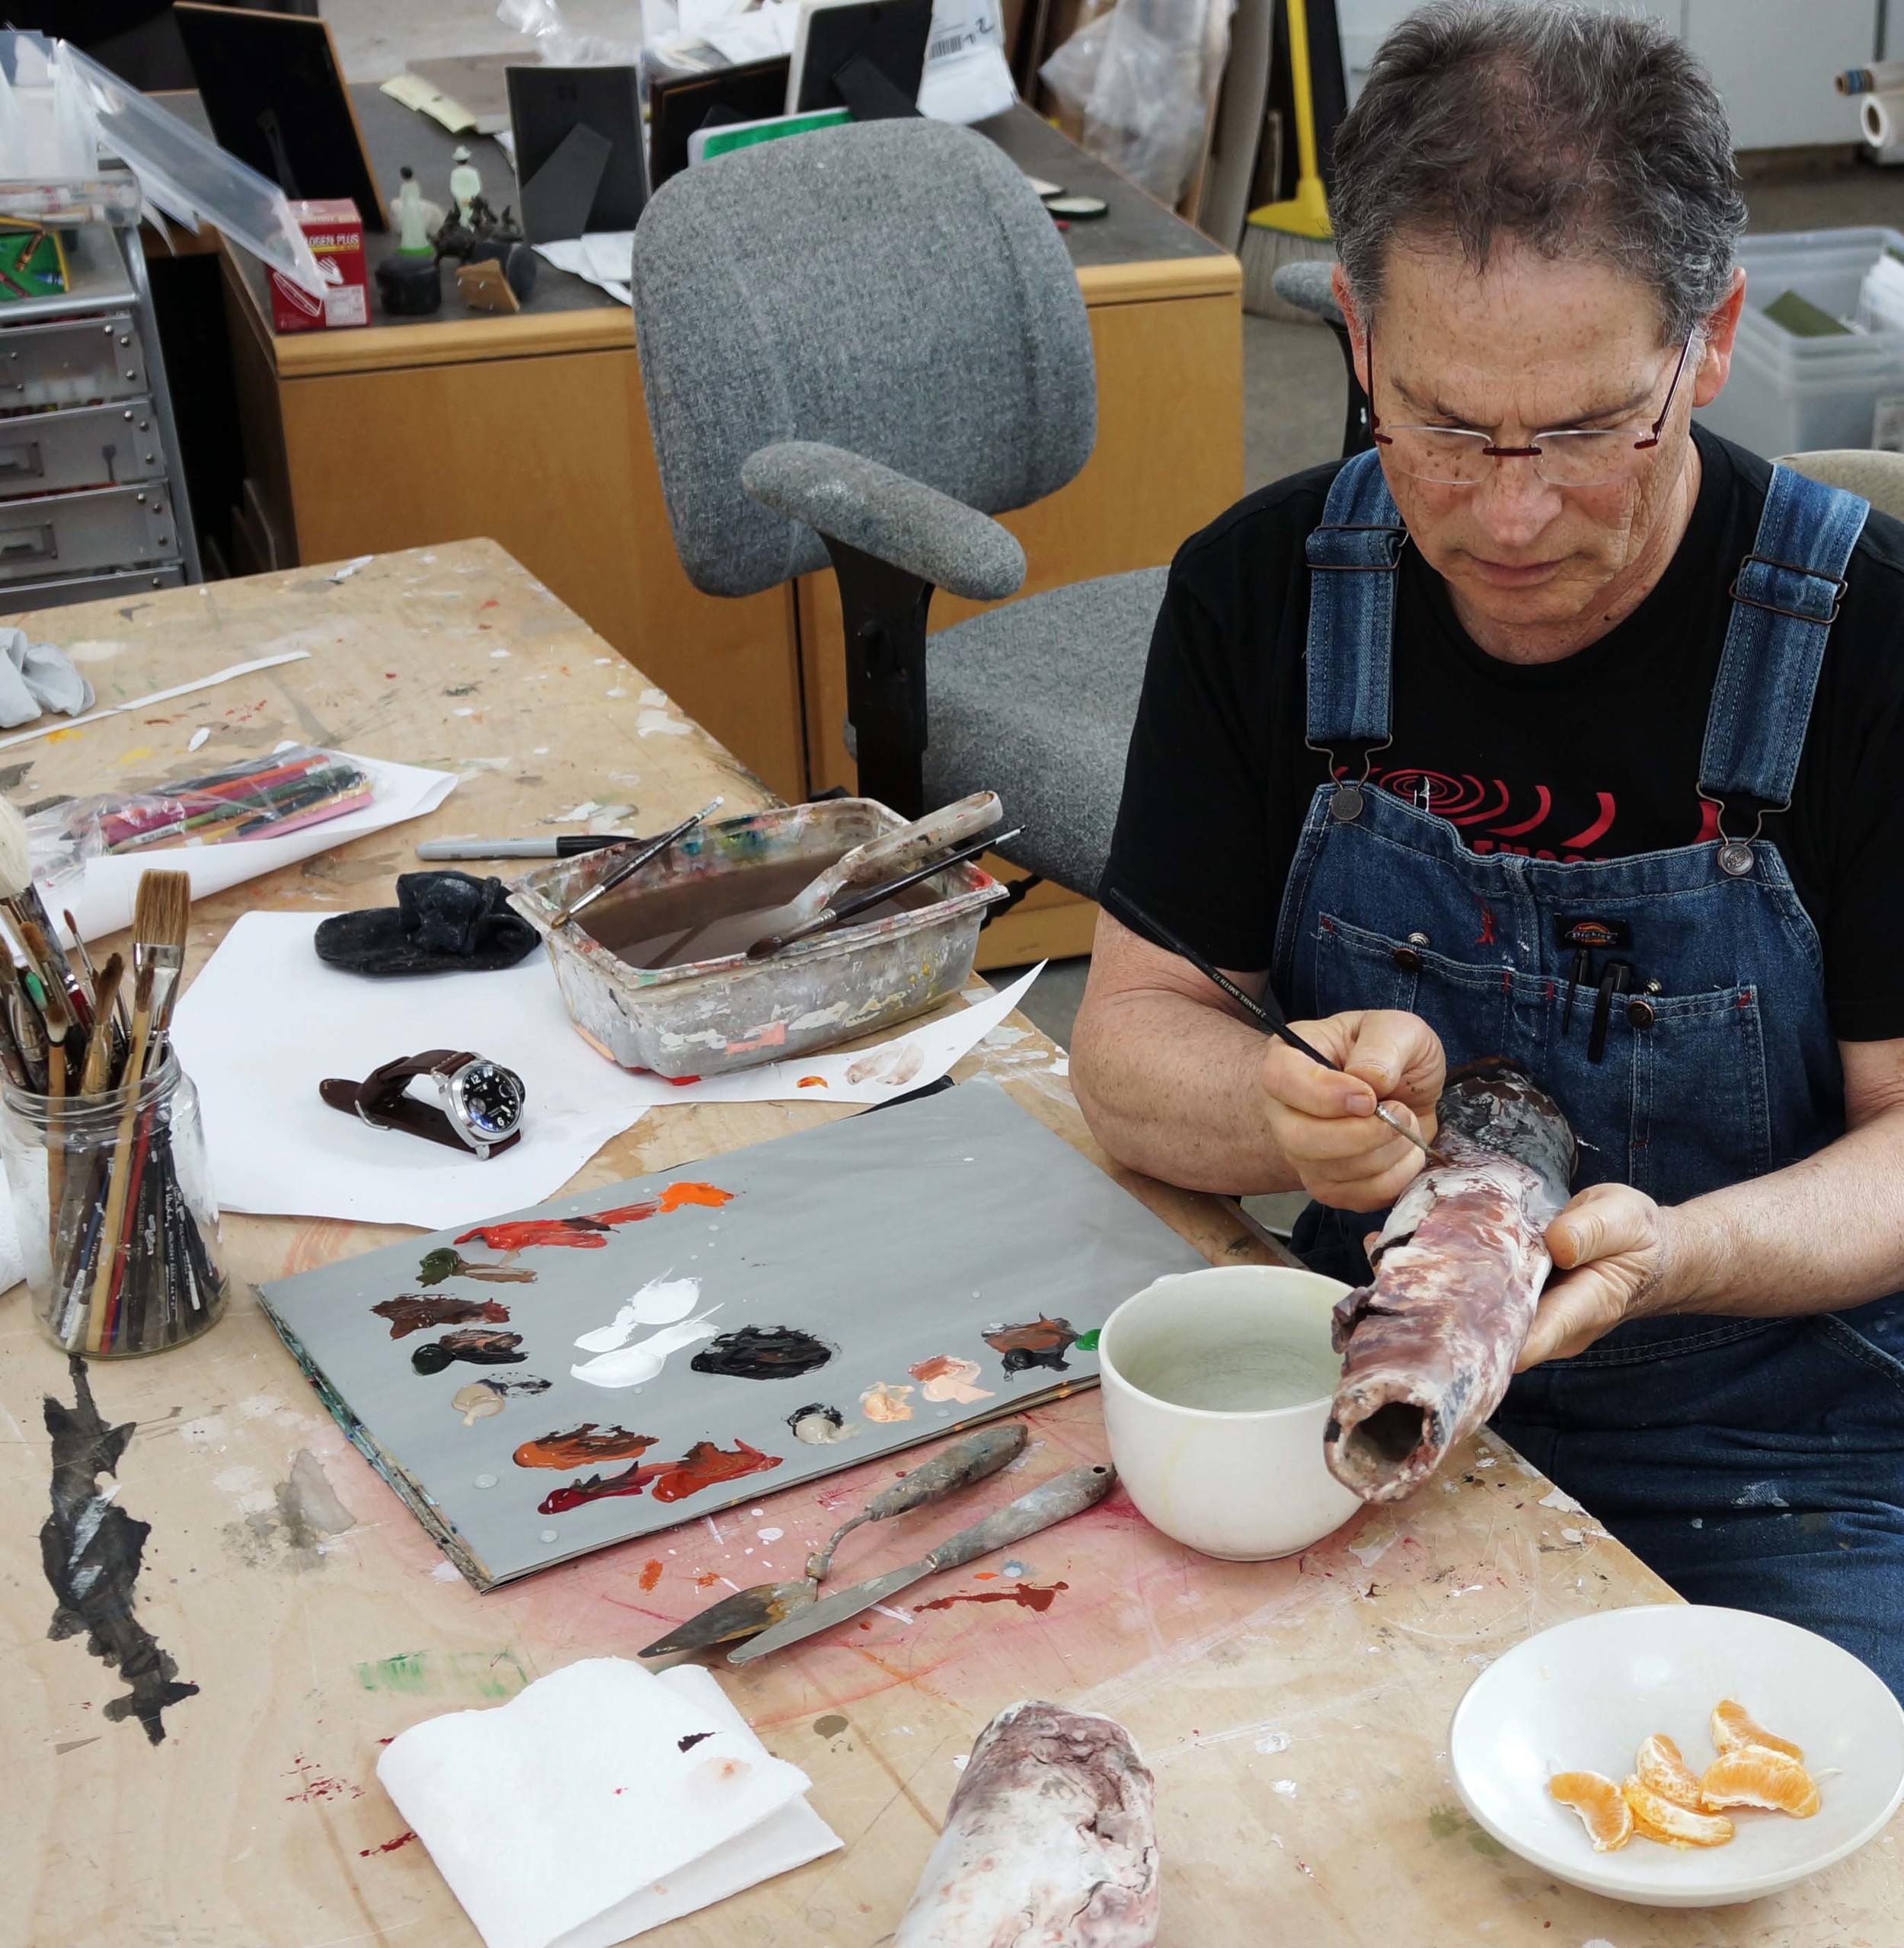 site- 2.24.13 ceramic 1 pt at work.jpg